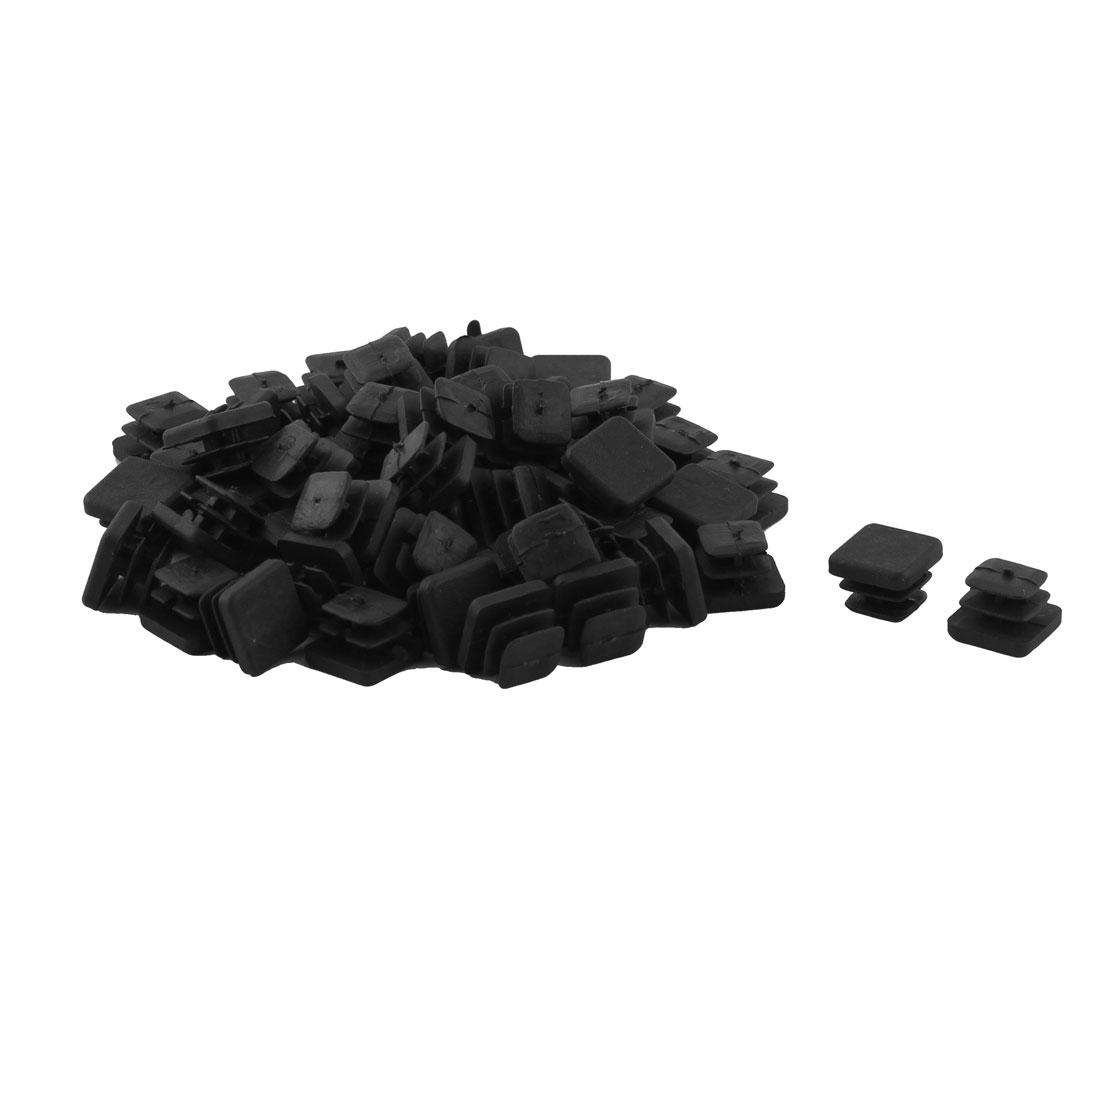 Plastic Square Design Tube Insert End Blanking Cover Cap Black 10 x 10mm 60pcs